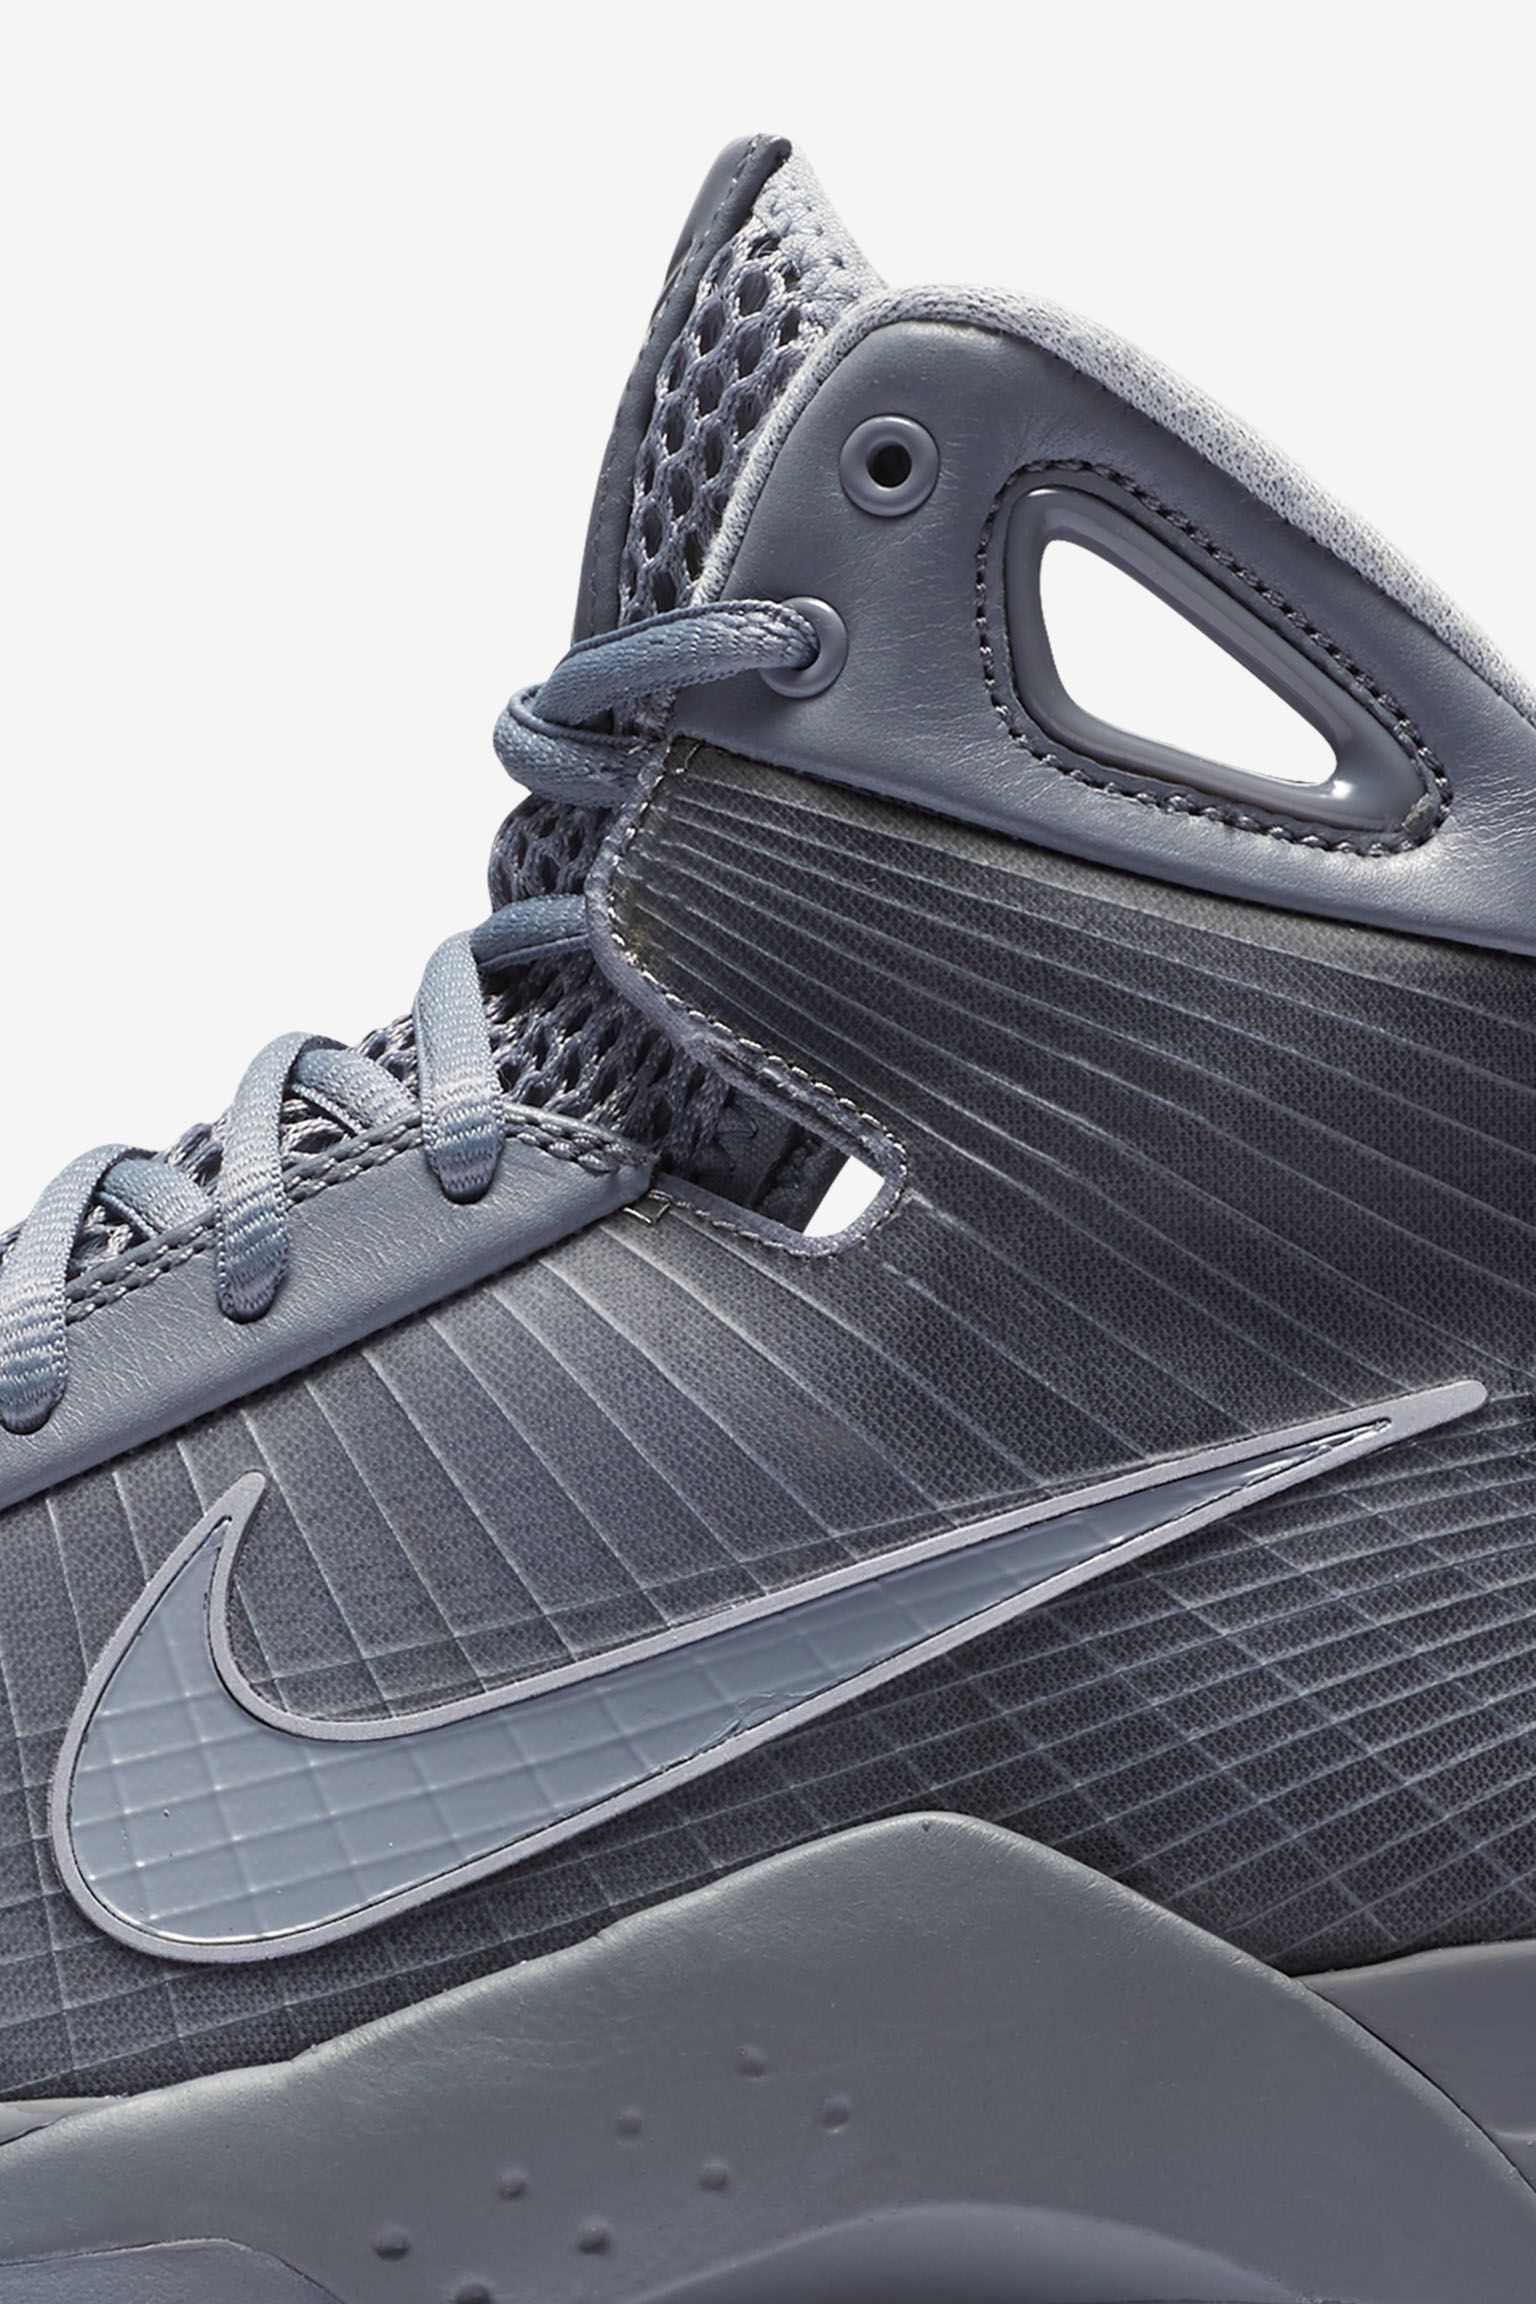 2c79e7f936ef Nike Hyperdunk 08 FTB  Black Mamba  Release Date. Nike+ SNKRS